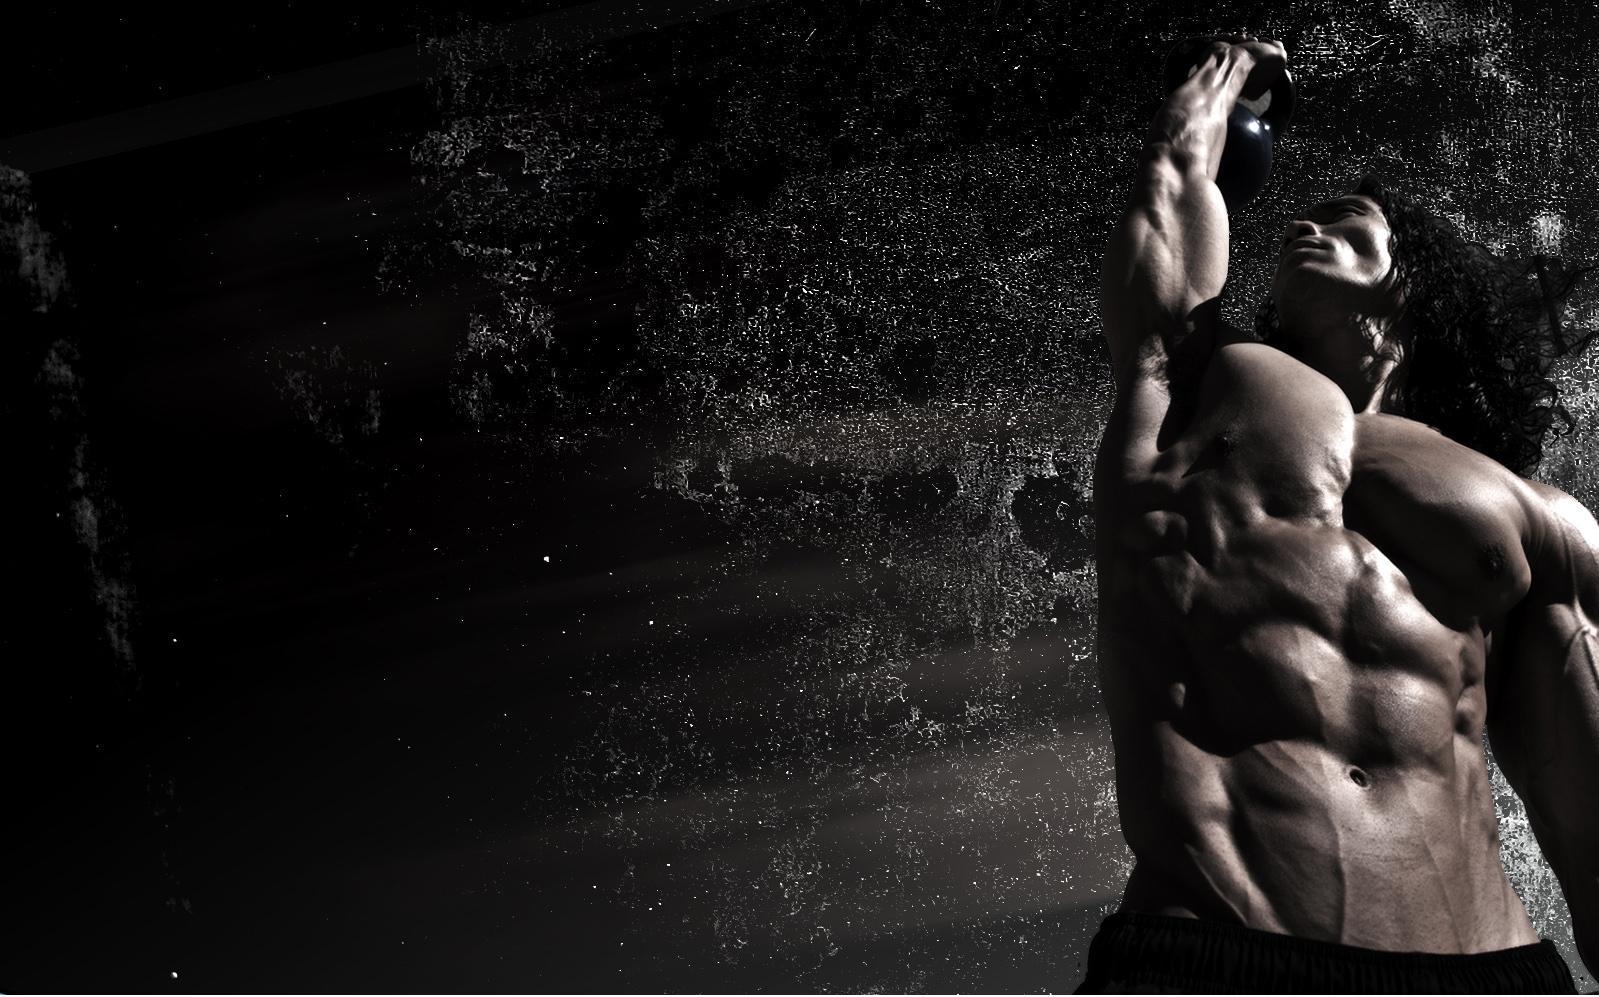 Fitness wallpaper hd wallpapersafari - Wallpaper fitness women ...